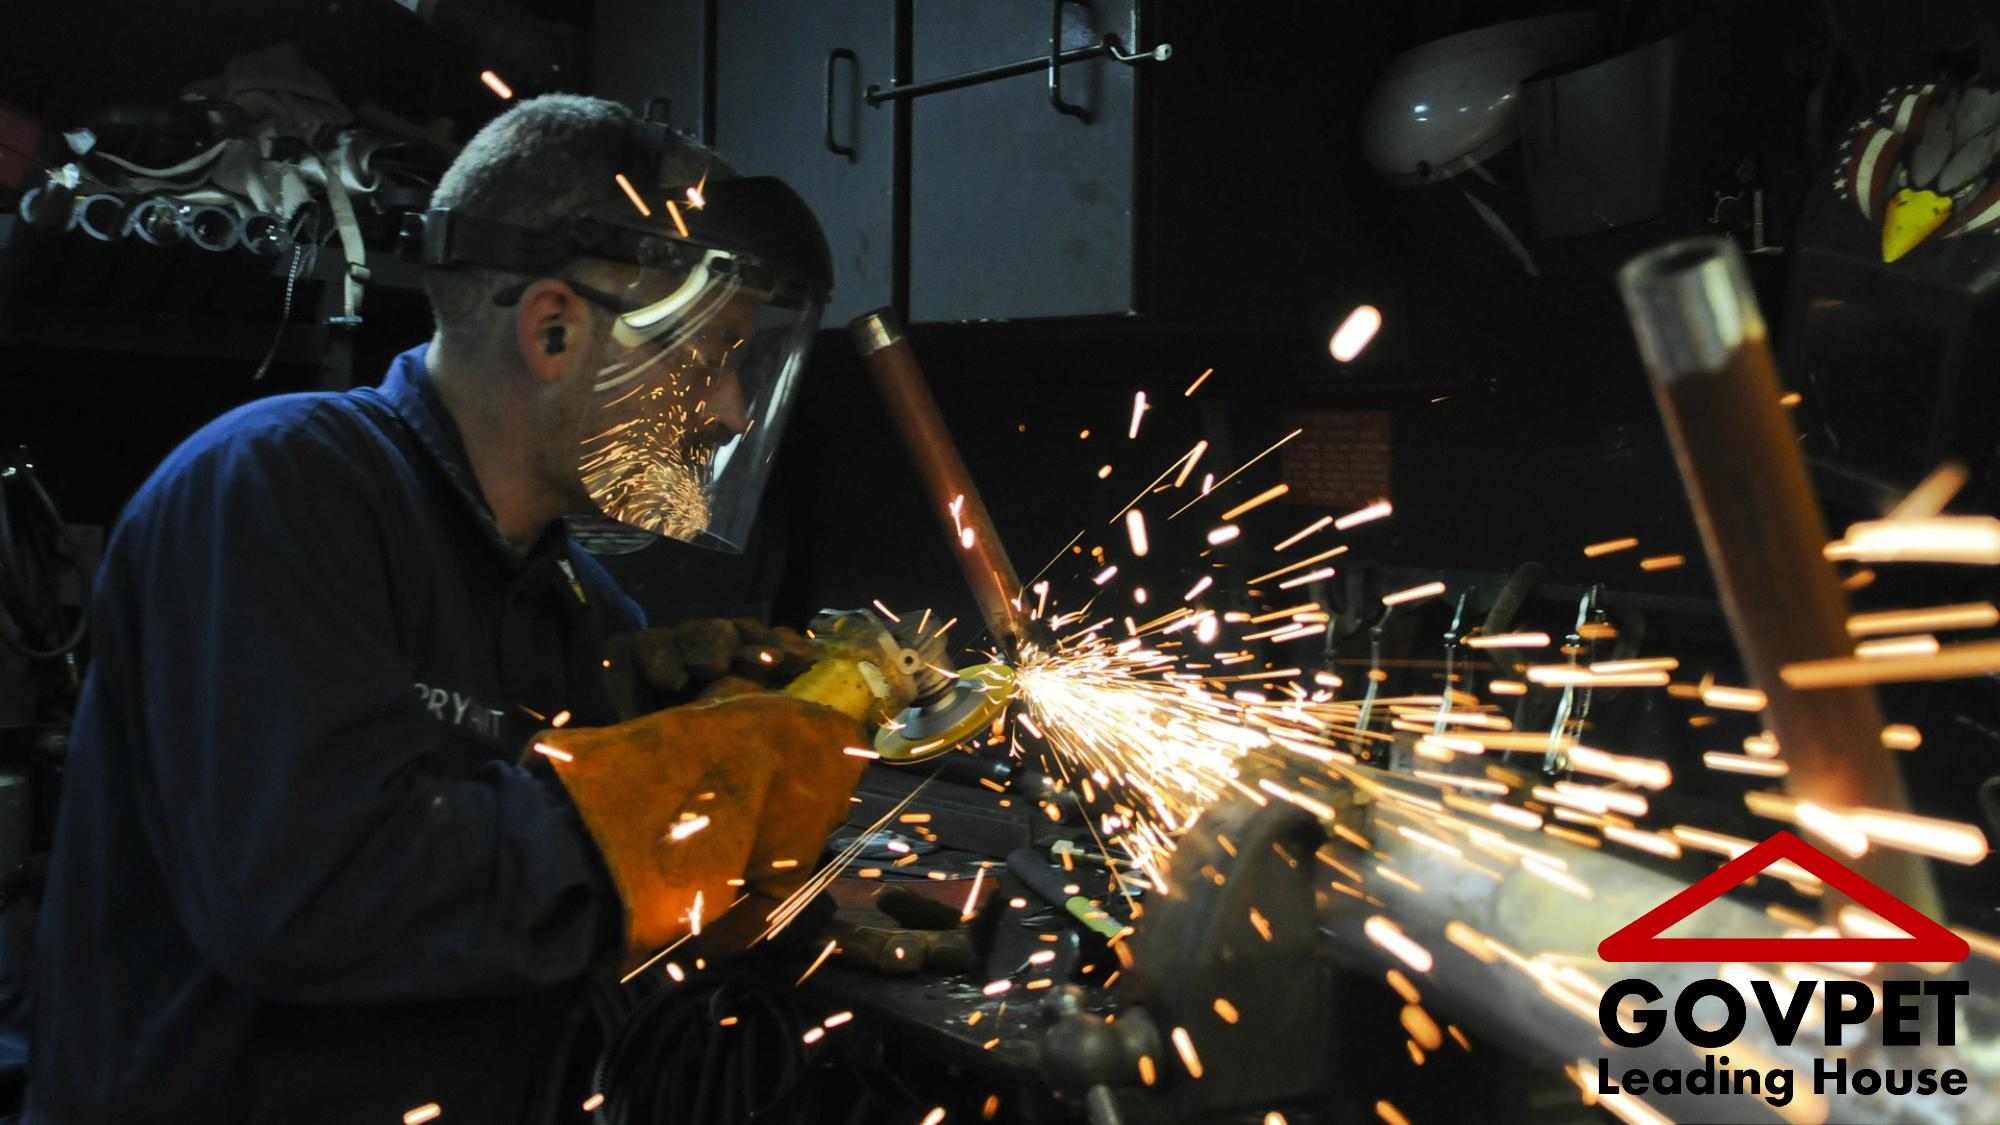 Metal Worker Trainee GOVPET